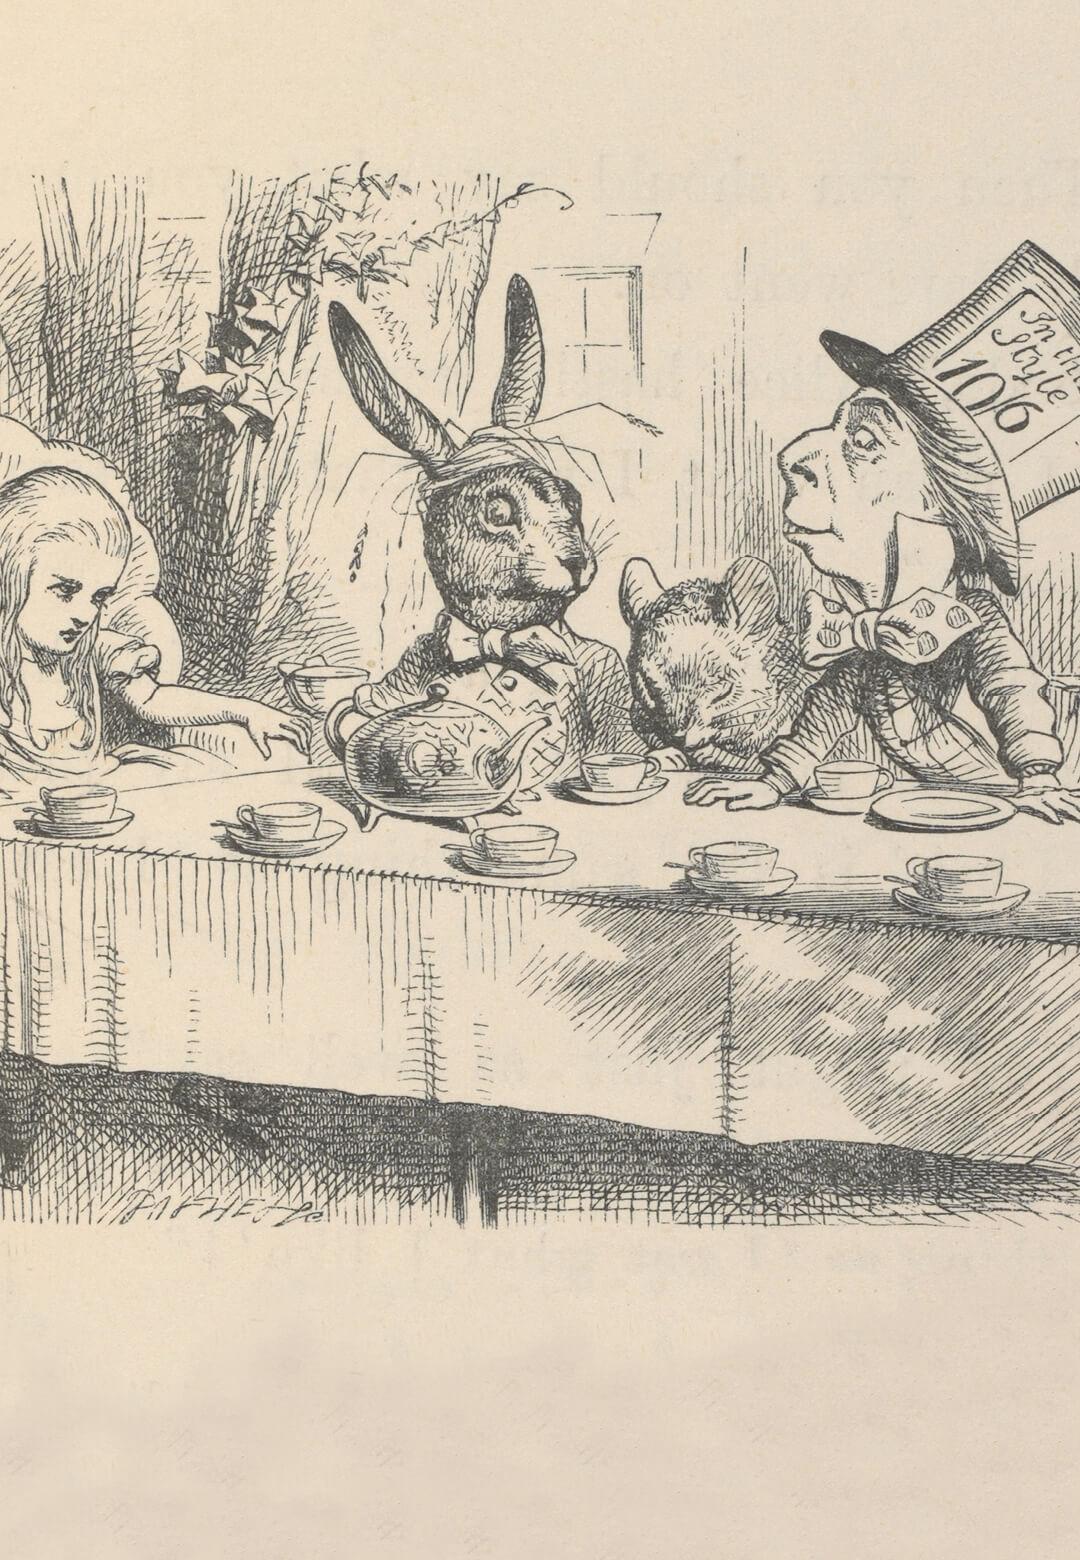 A preliminary sketch by John Tenniel in 1865   Alice: Curiouser and Curiouser   John Tenniel   STIRworld